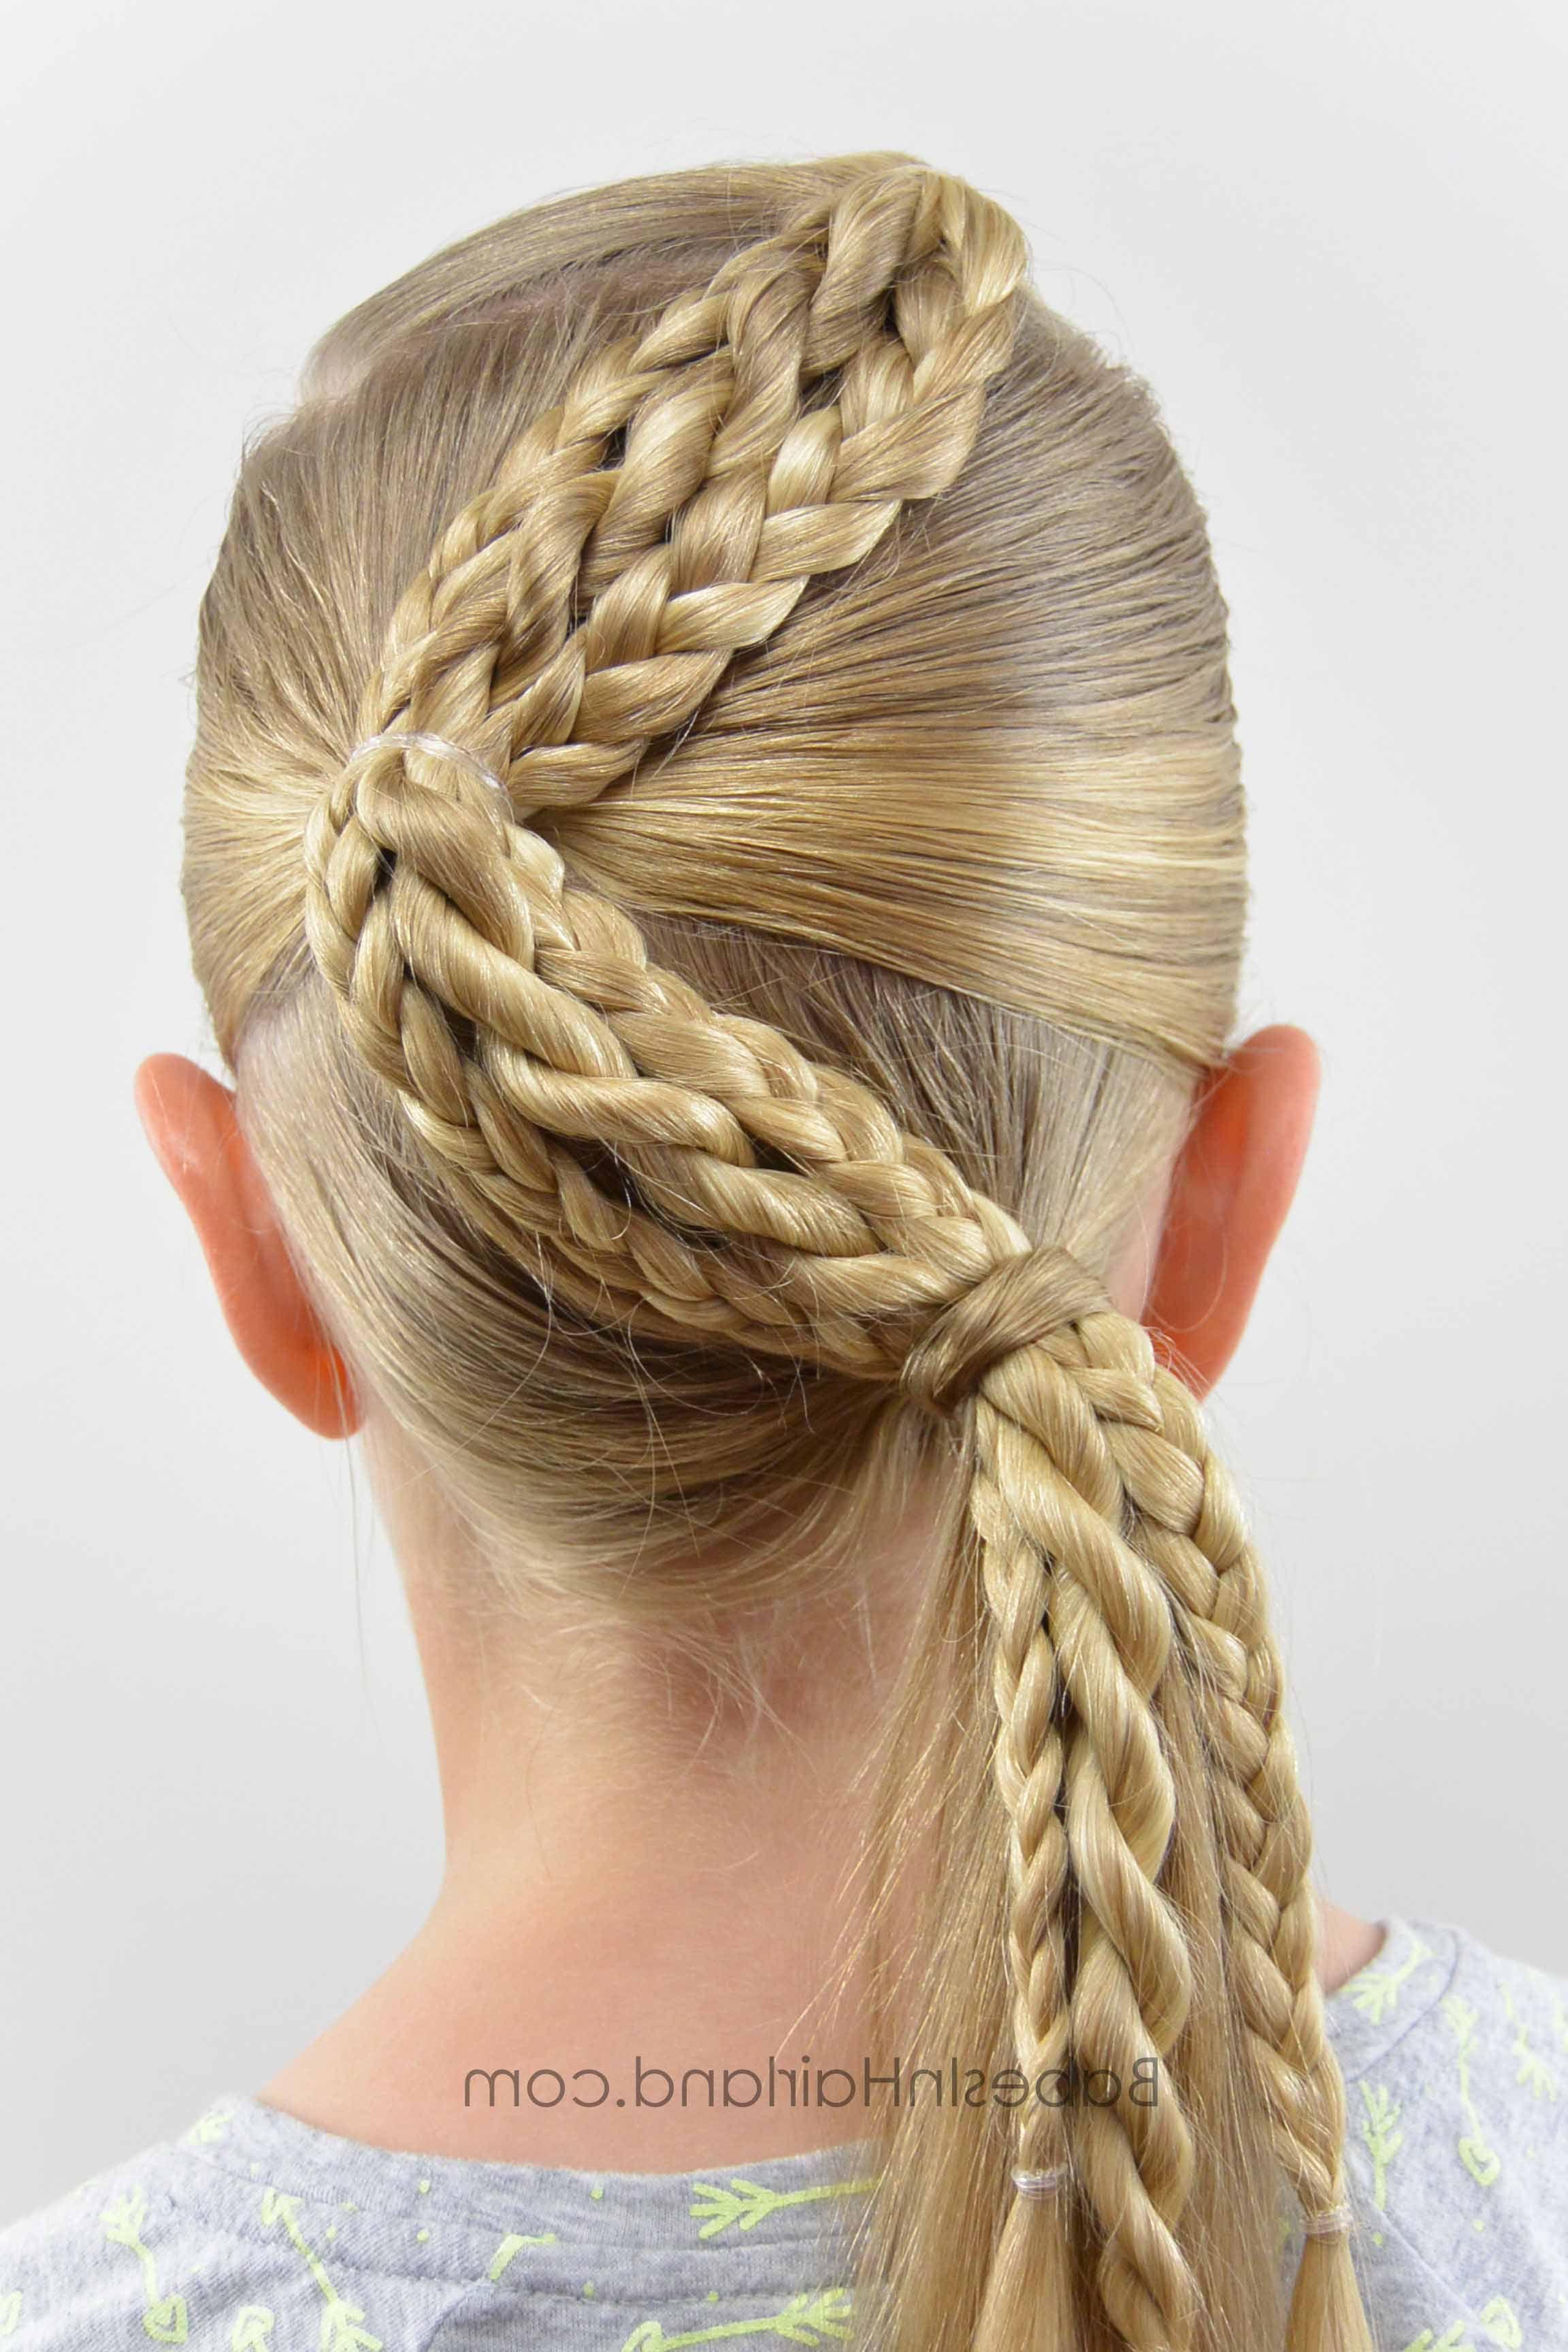 Popular Zig Zag Ponytail Updo Hairstyles Within Zig Zag Braids From Babesinhairland #hair #braids (View 15 of 20)